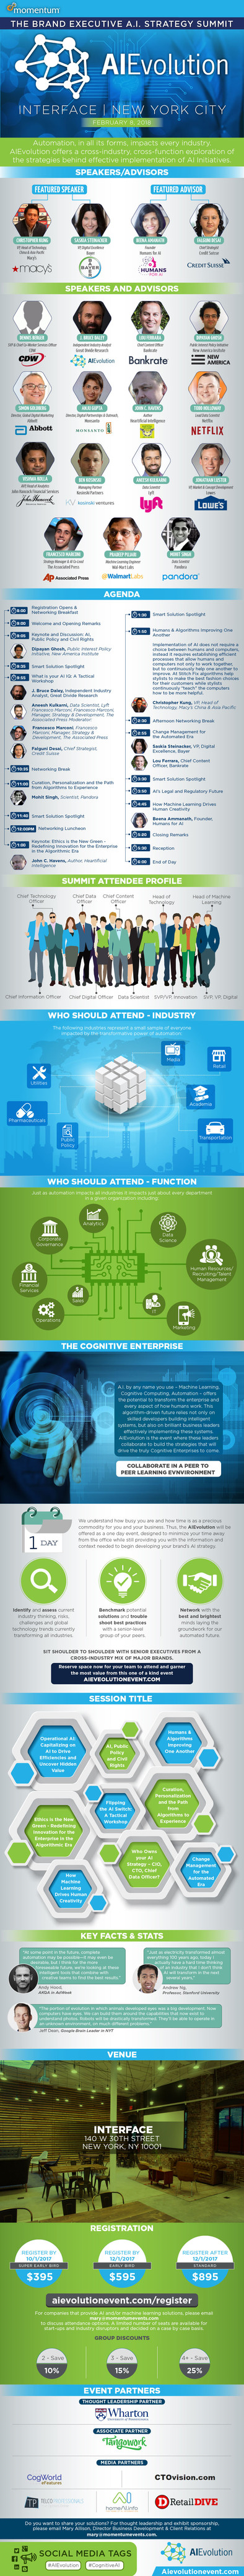 The Brand Executive A.I. Strategy Summit